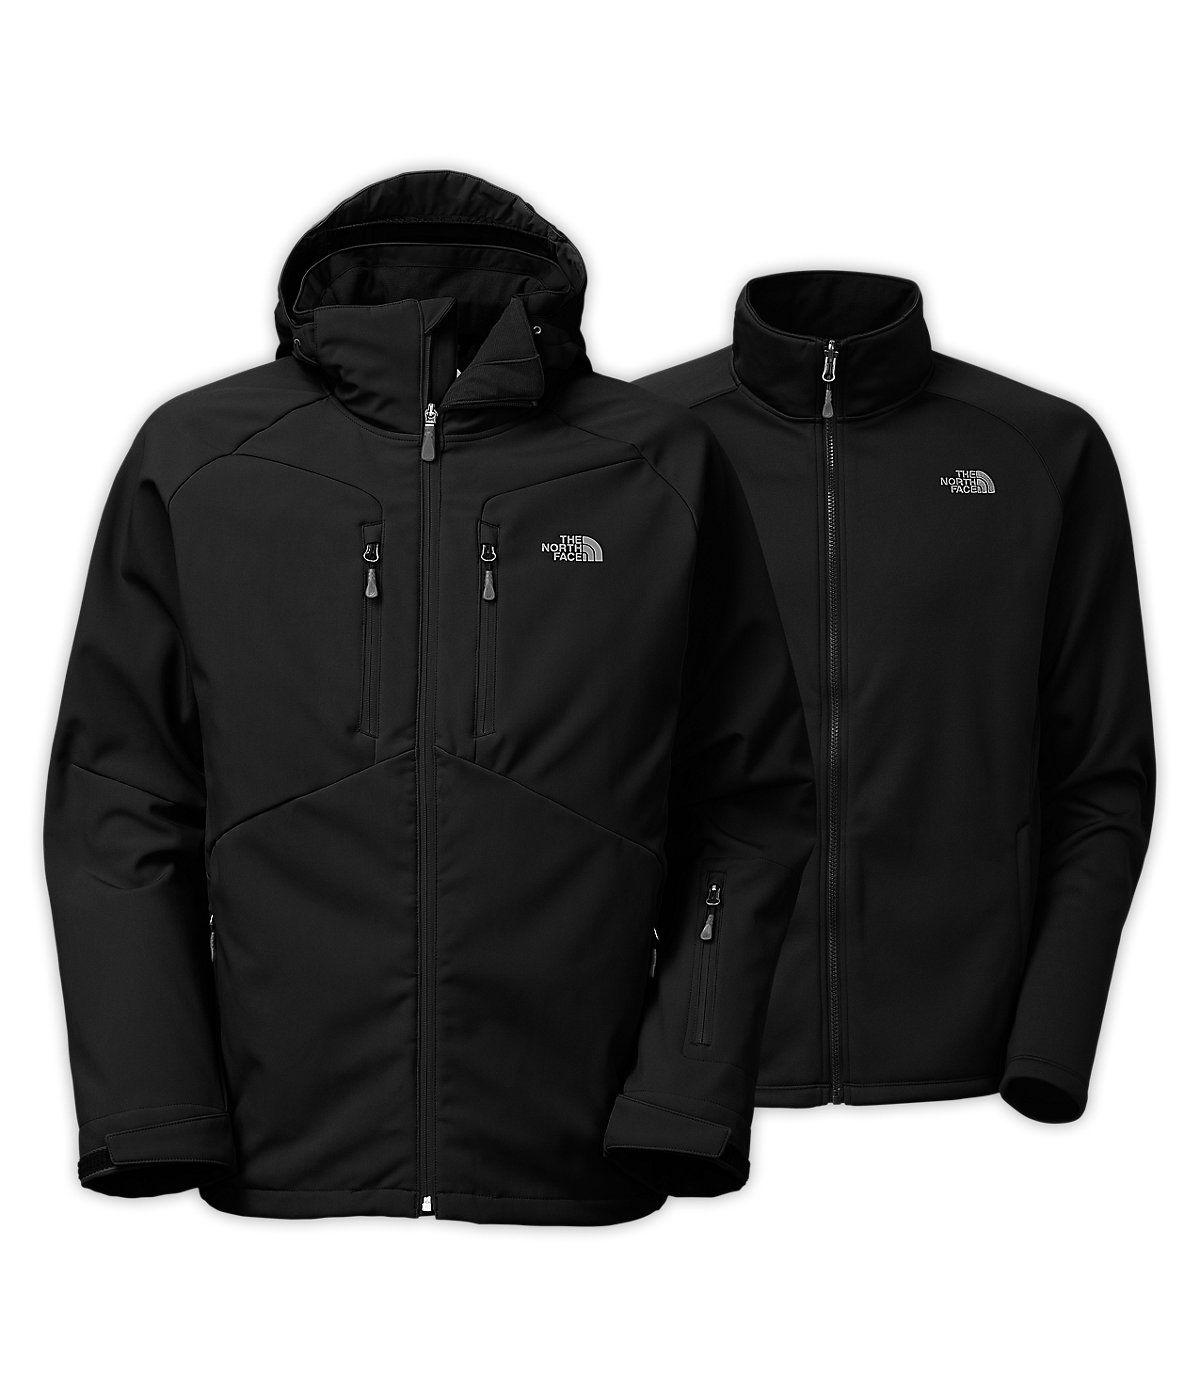 Men S Apex Storm Peak Triclimate Jacket The North Face Triclimate Jacket Jackets Mens Vest Jacket [ 1396 x 1200 Pixel ]